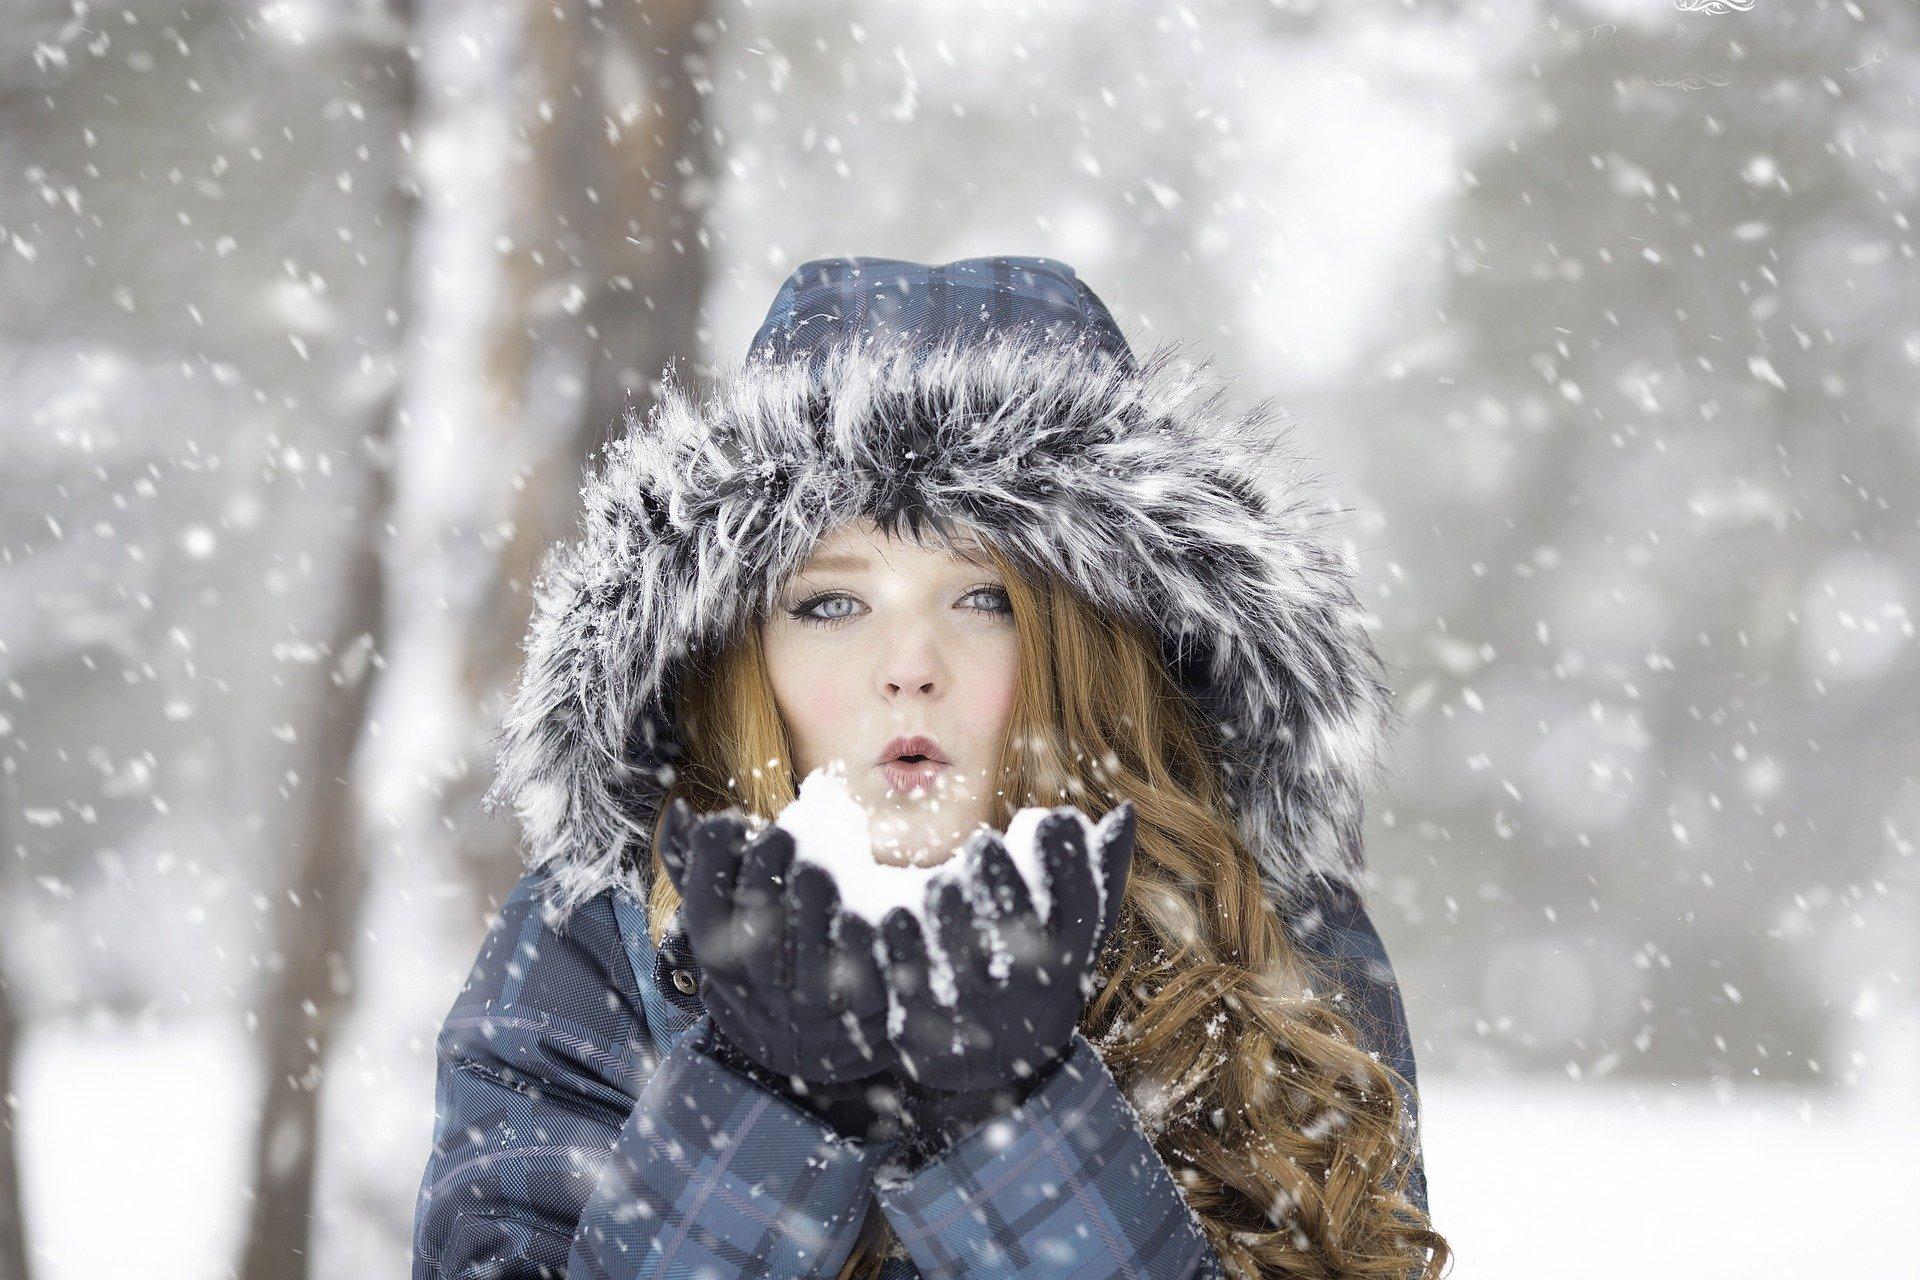 Problemy skórne zimą